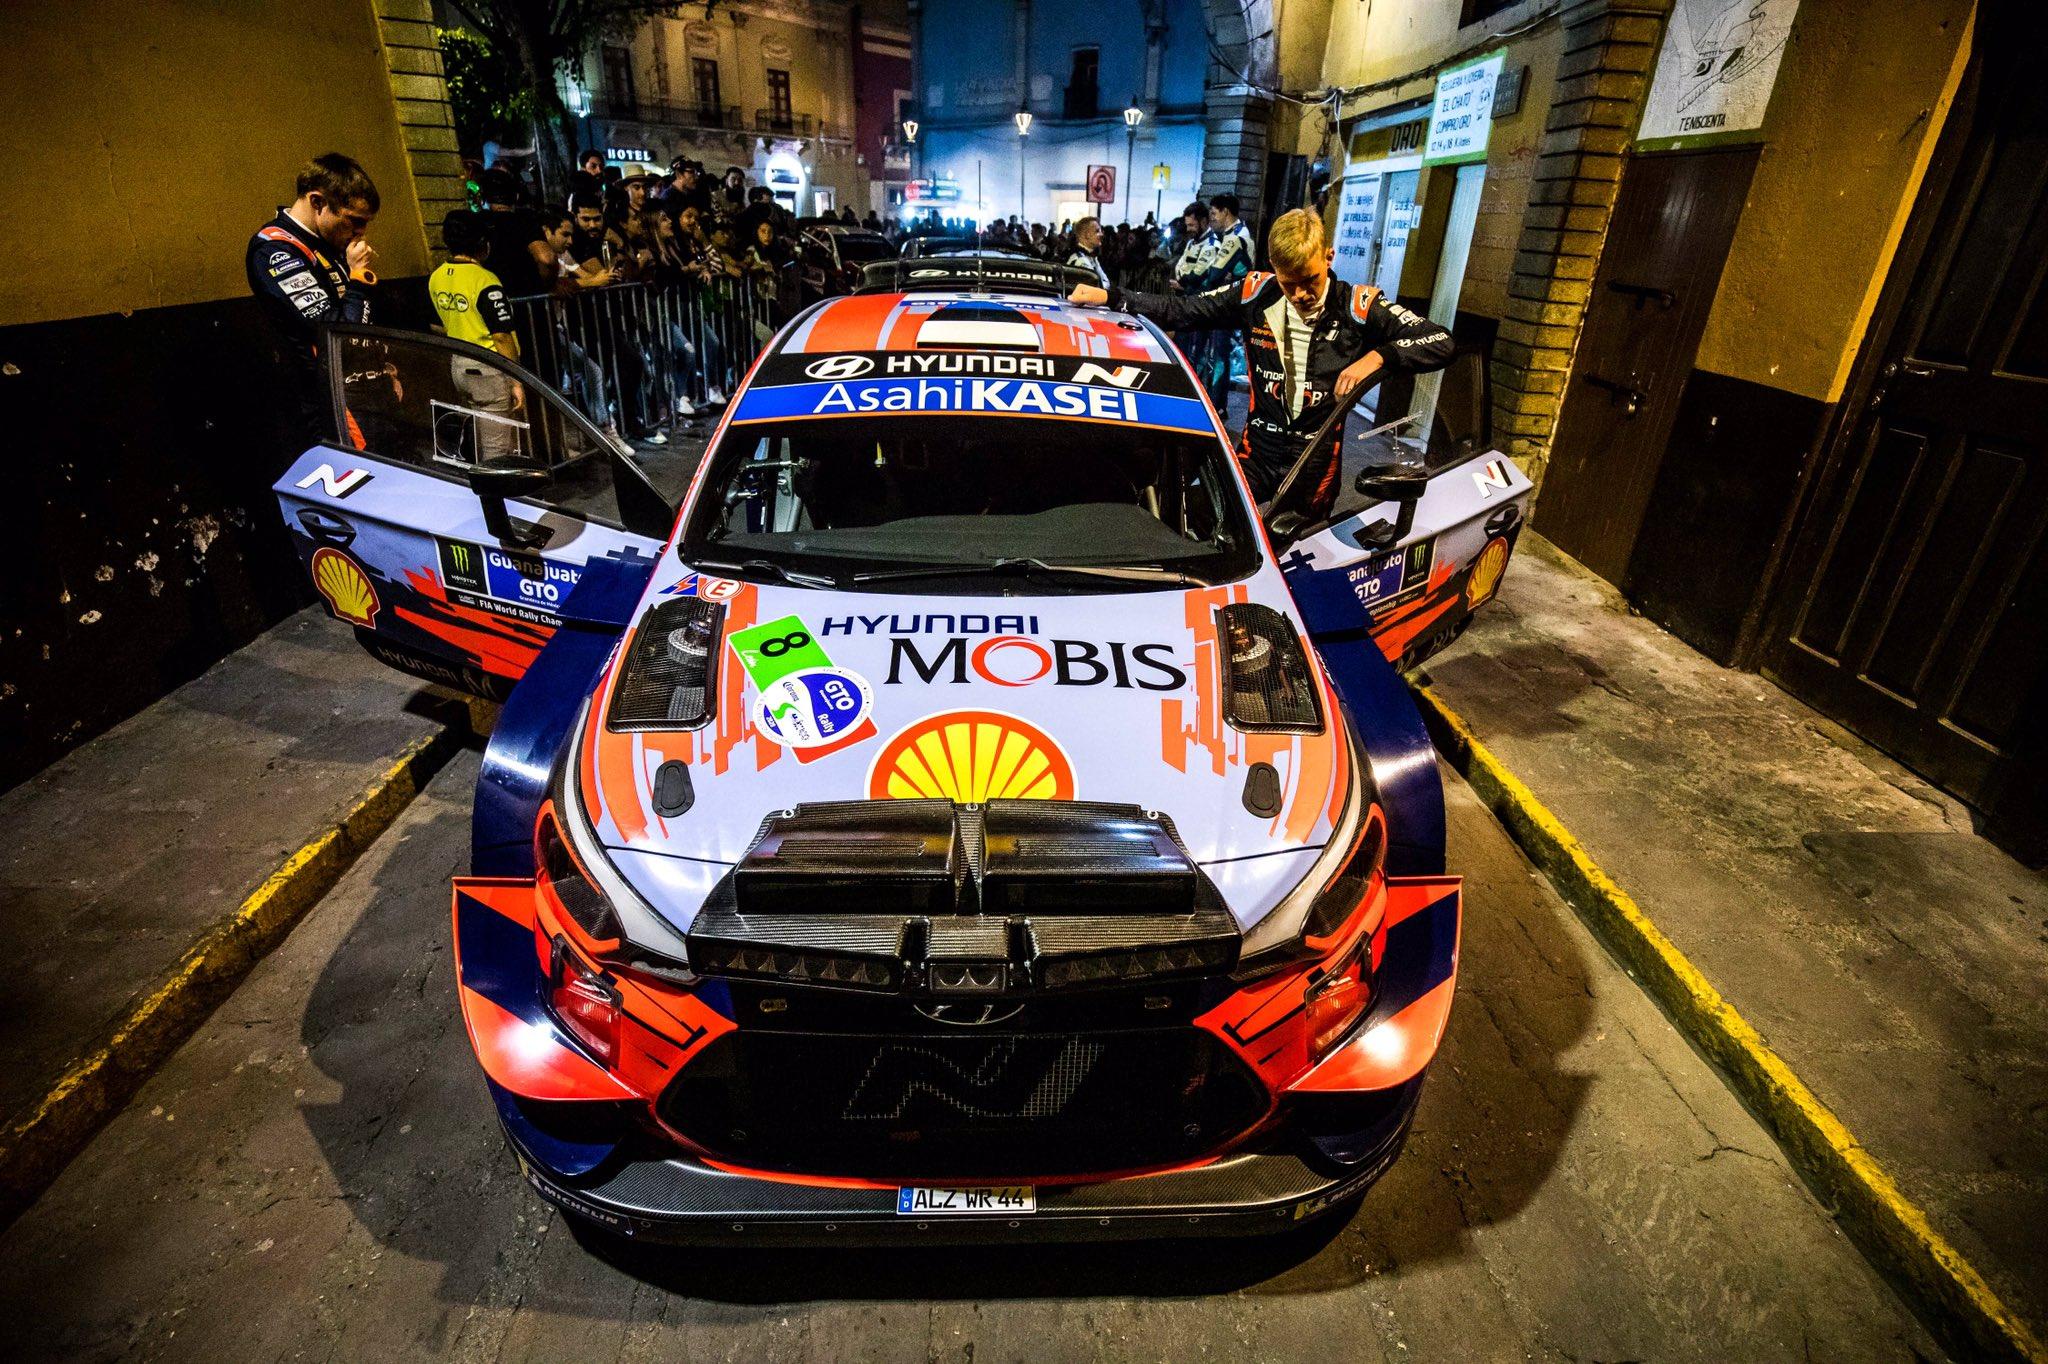 WRC: 17º Rallye Guanajuato Corona - México [12-15 Marzo] - Página 2 ES-Hpo5WkAAgqvA?format=jpg&name=large